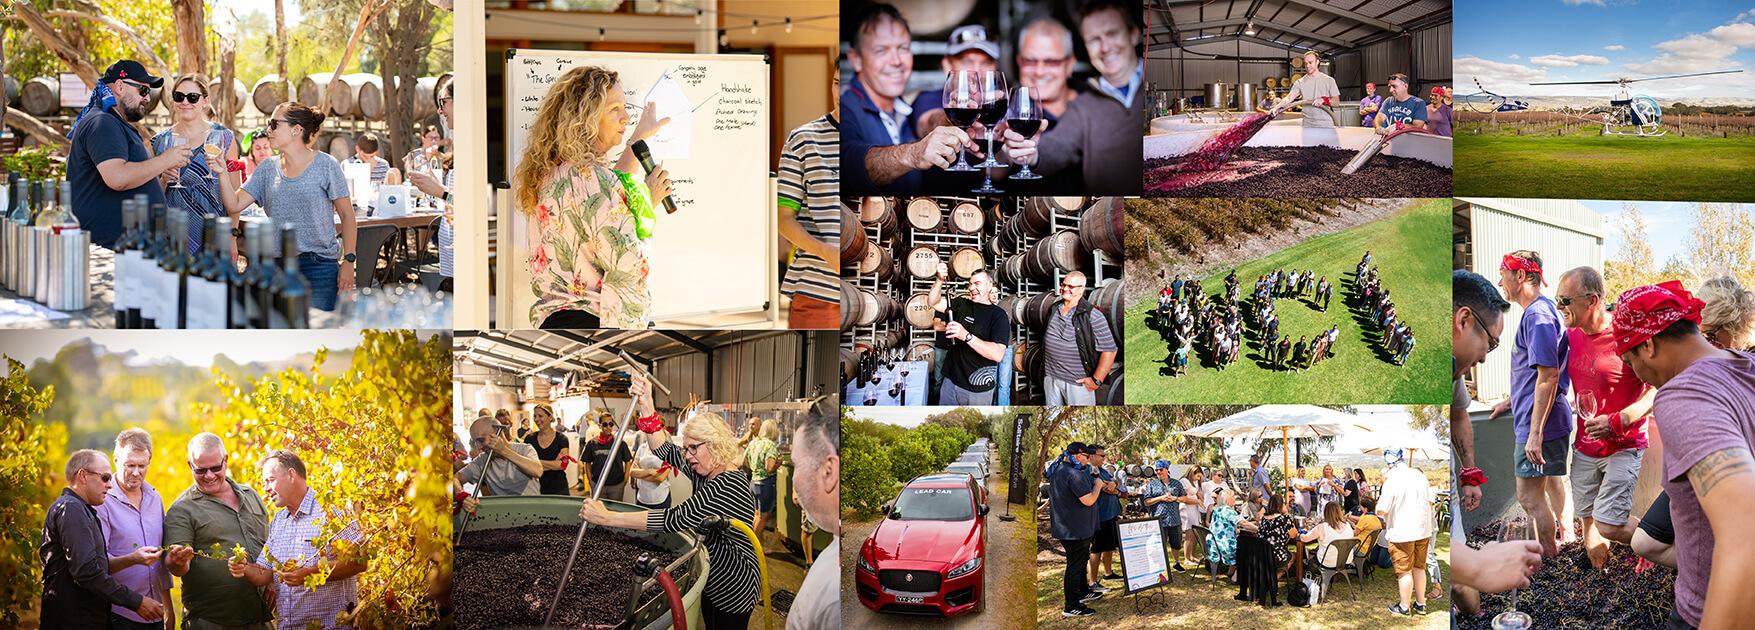 Corporate Event Venue McLaren Vale - Ekhidna Wines